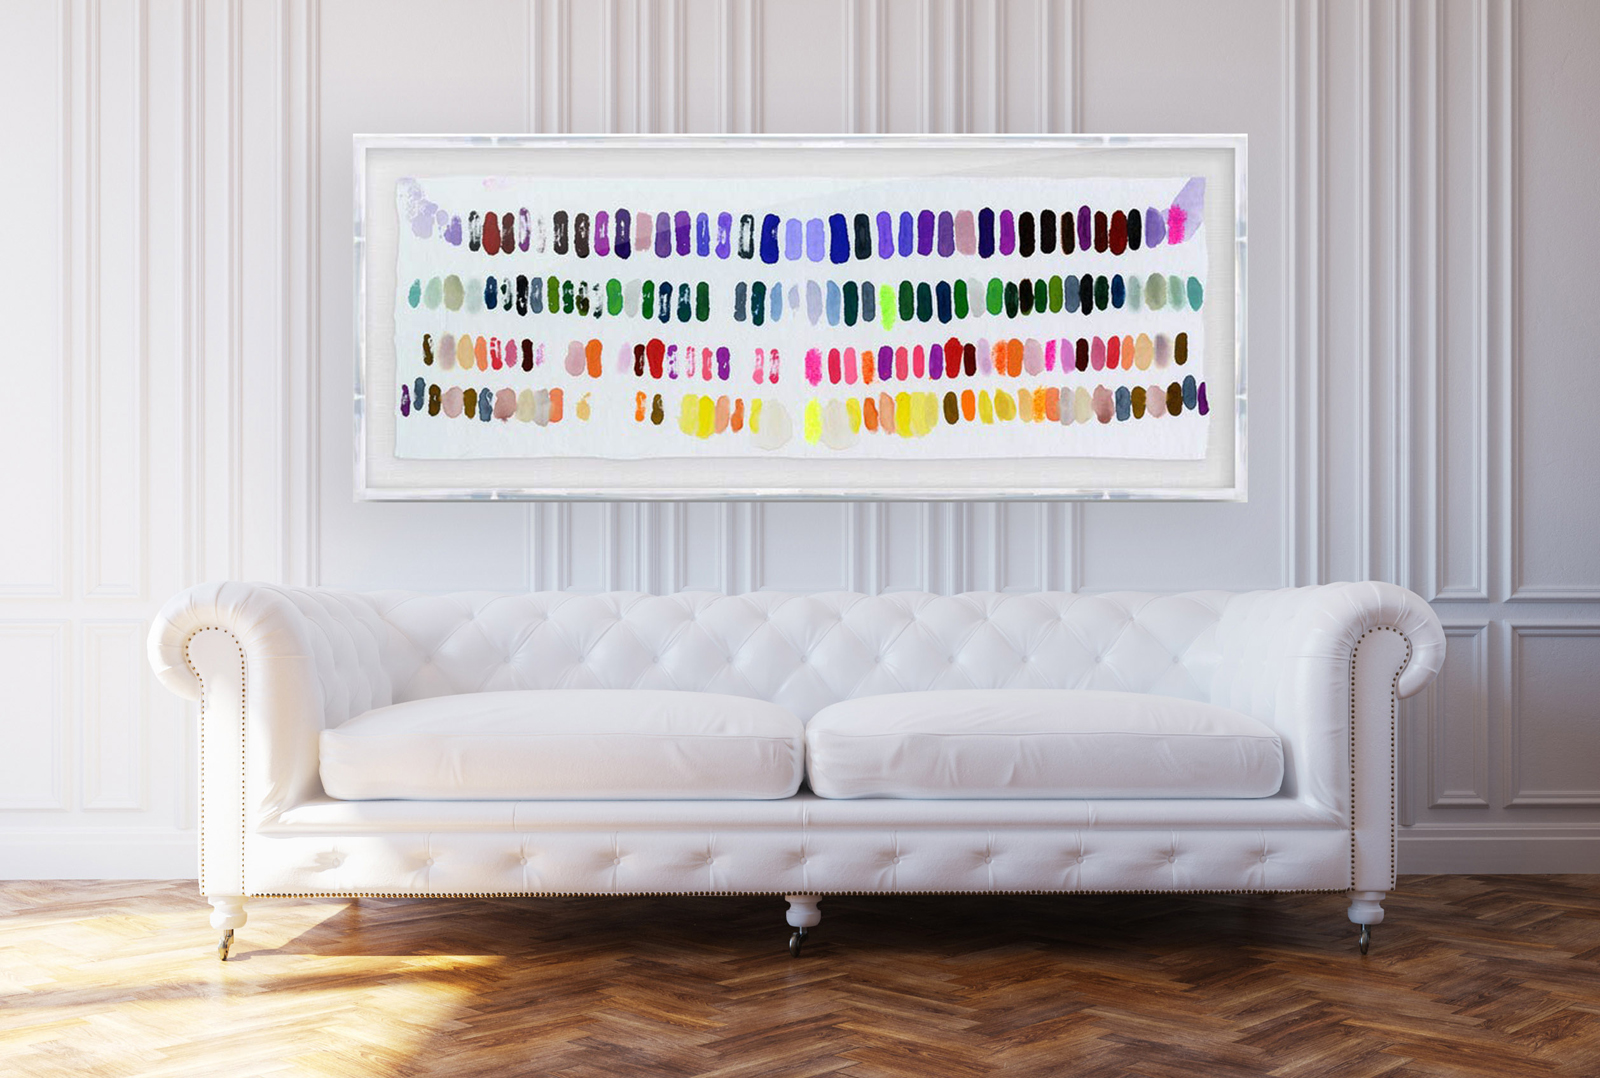 Kristi-Kohut-art-homes-colorful978.jpg